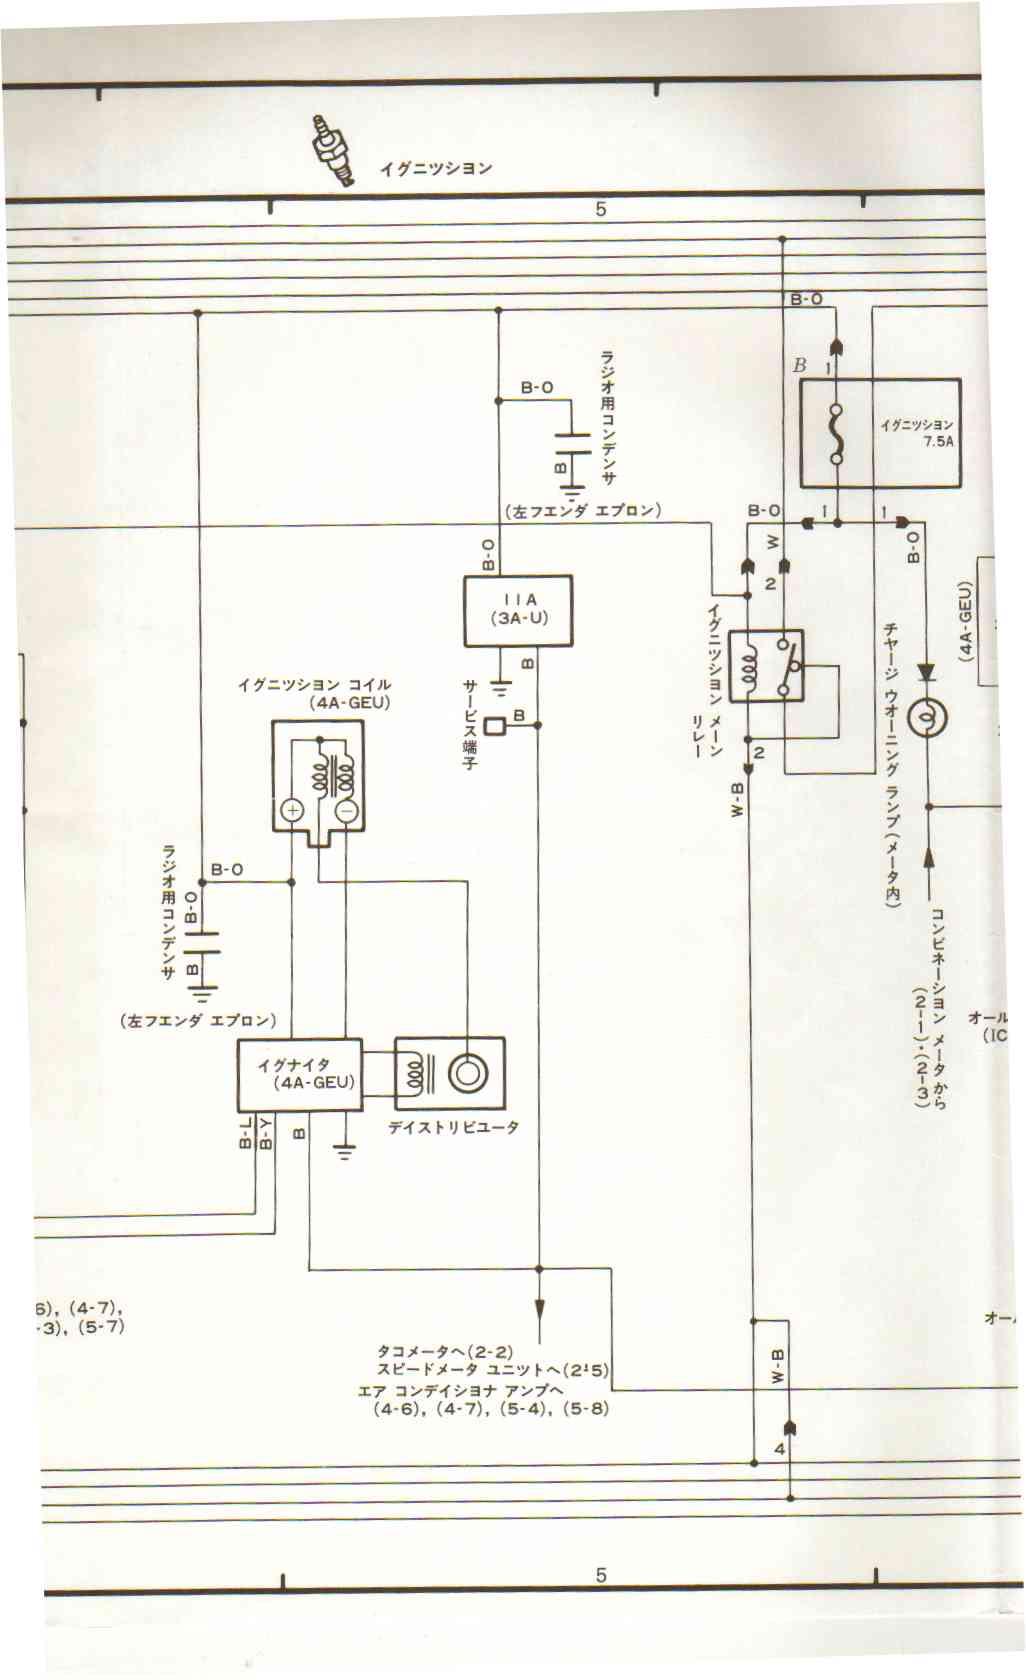 ae86 wiring ignition ecu    ae86    4a ge japan  ecu    ae86    4a ge japan